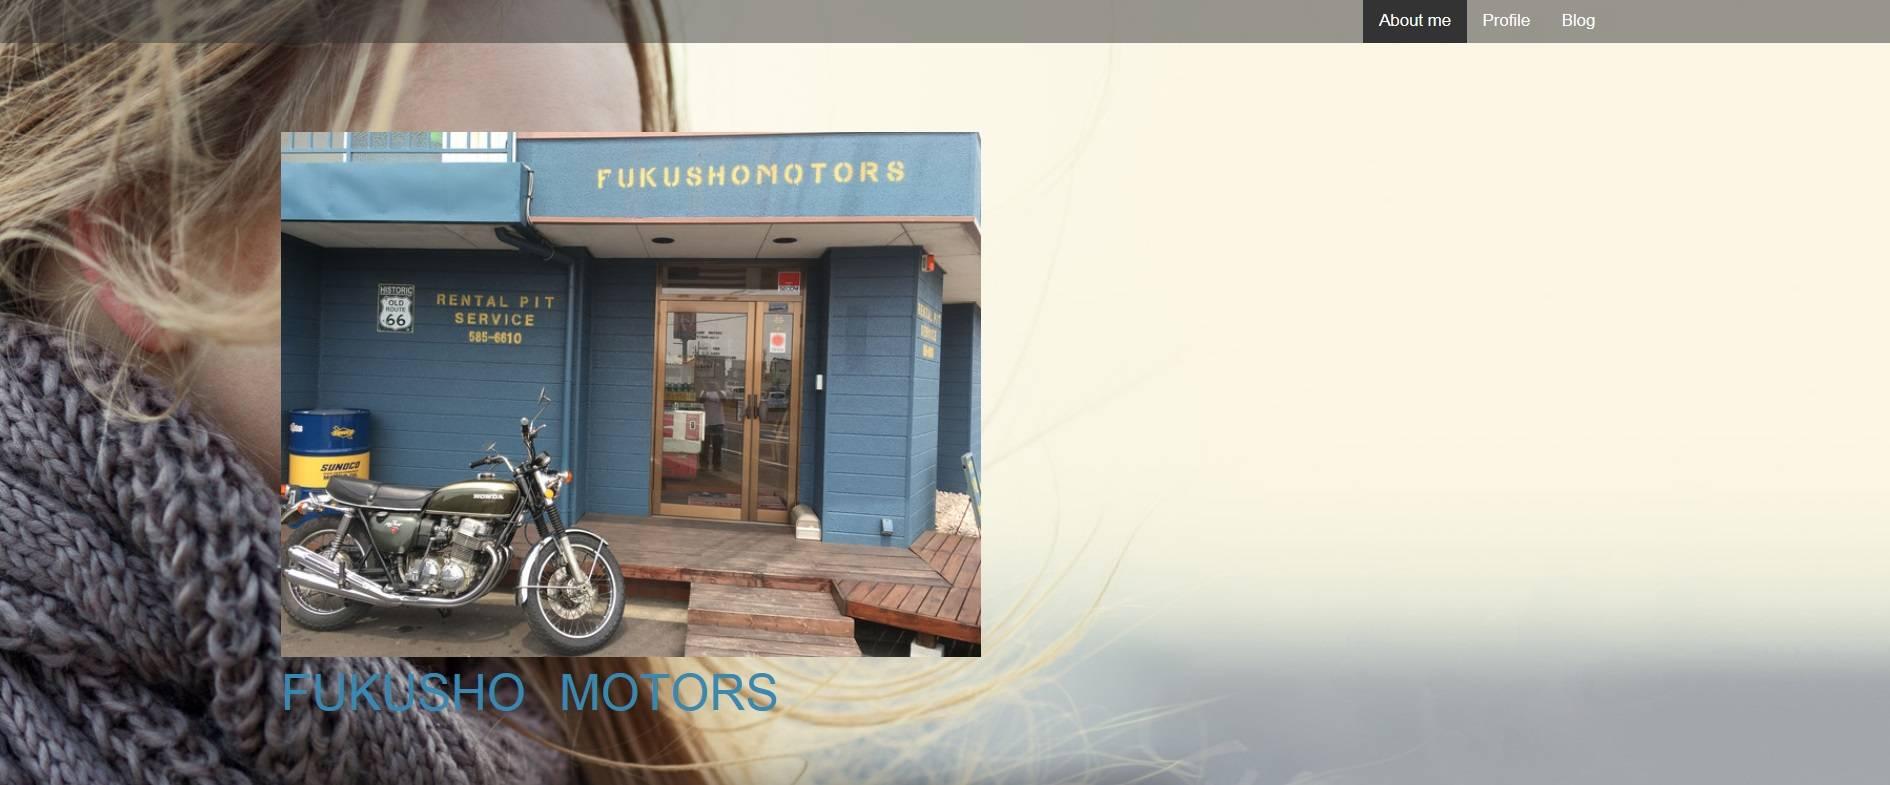 FUKUSHO MOTORS